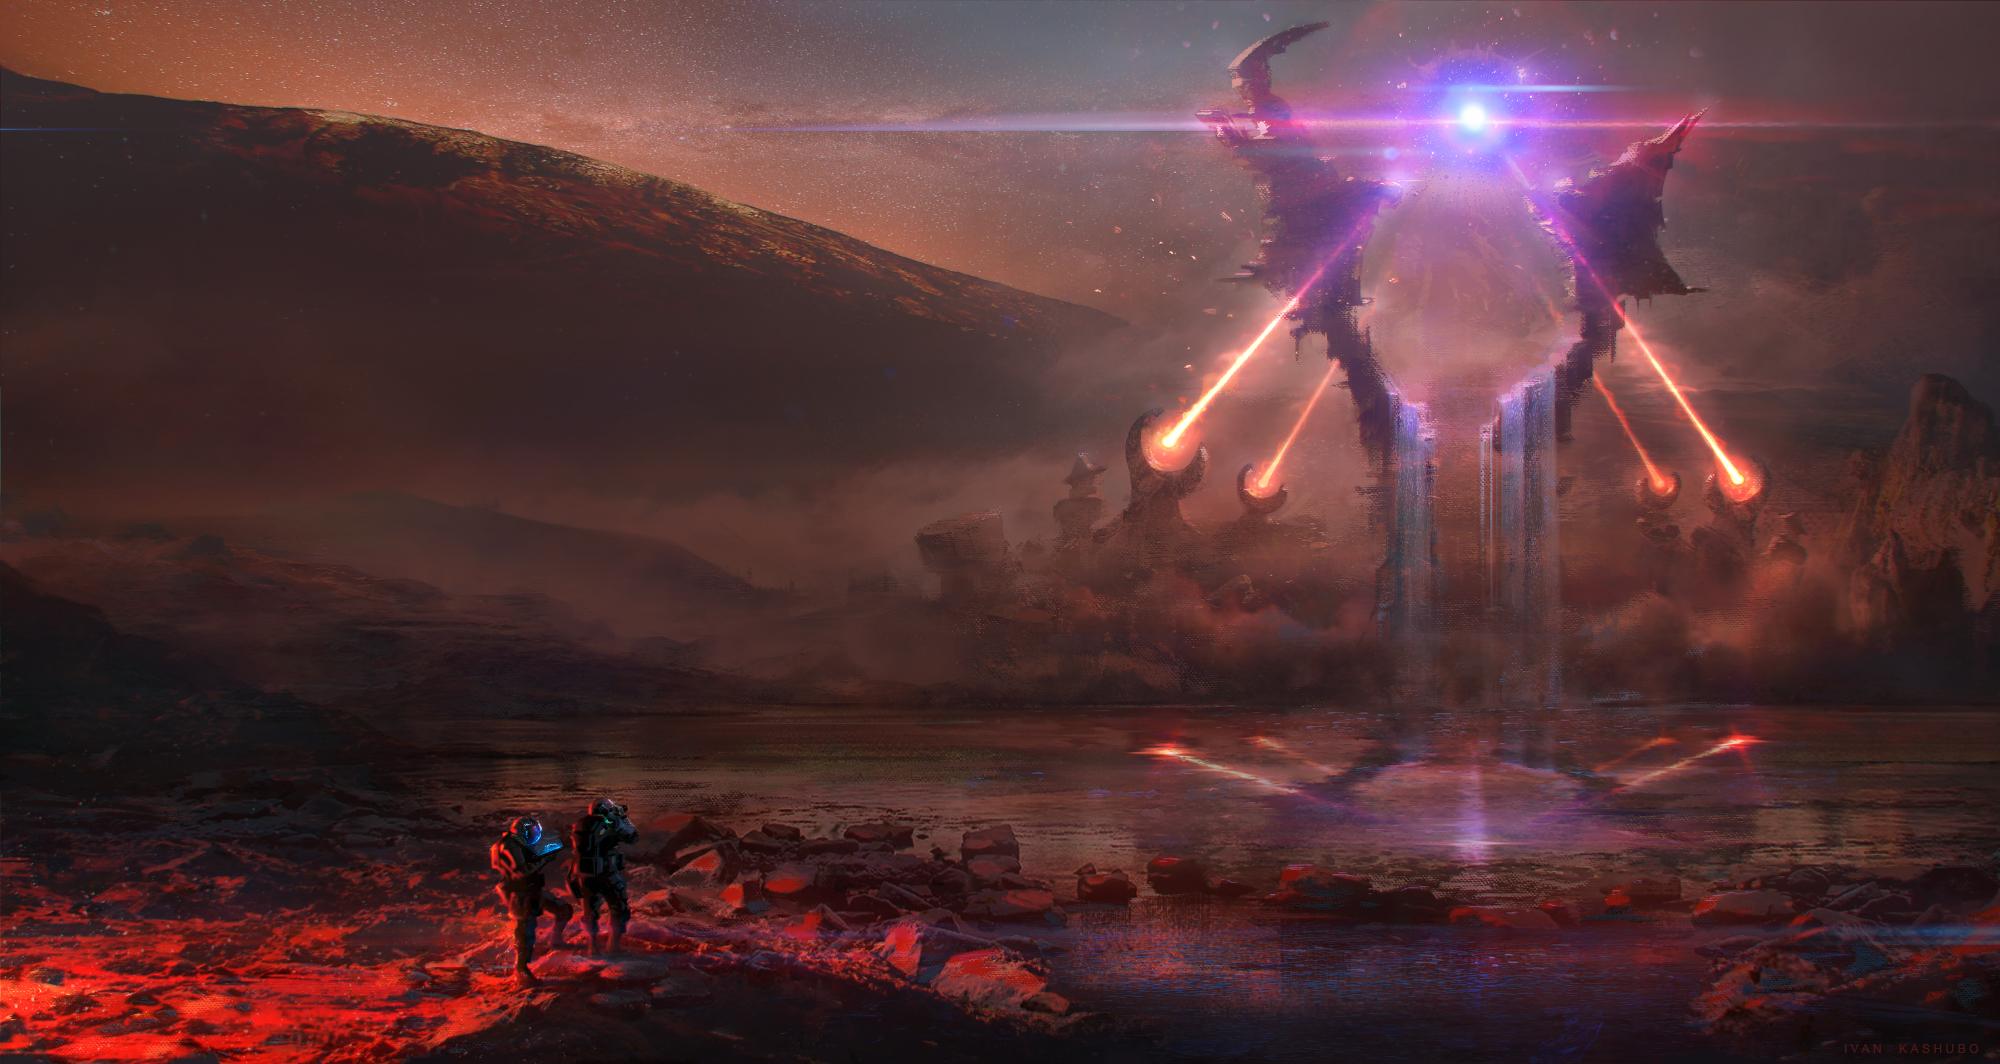 Sci Fi Landscape 2000x1064